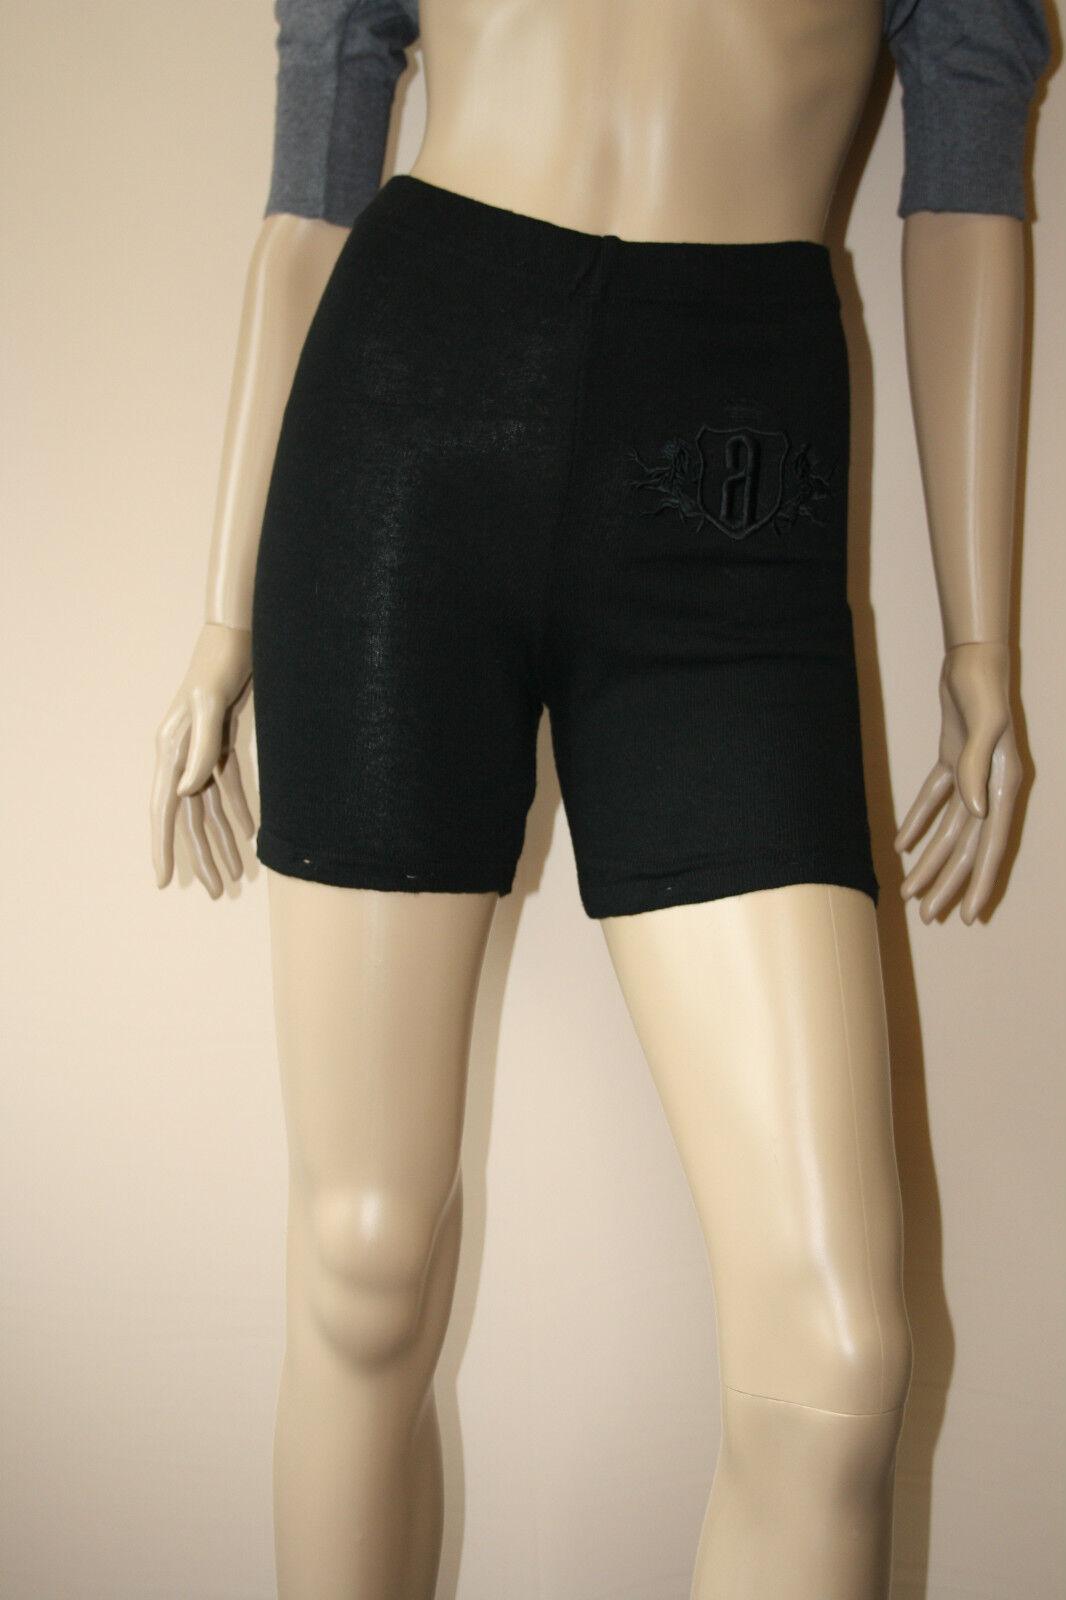 Annhagen-Pantaloncini combinata-knöpfbar-Radler combinata-knöpfbar-Radler combinata-knöpfbar-Radler prima o poi portatile-Taglia S - dd950d